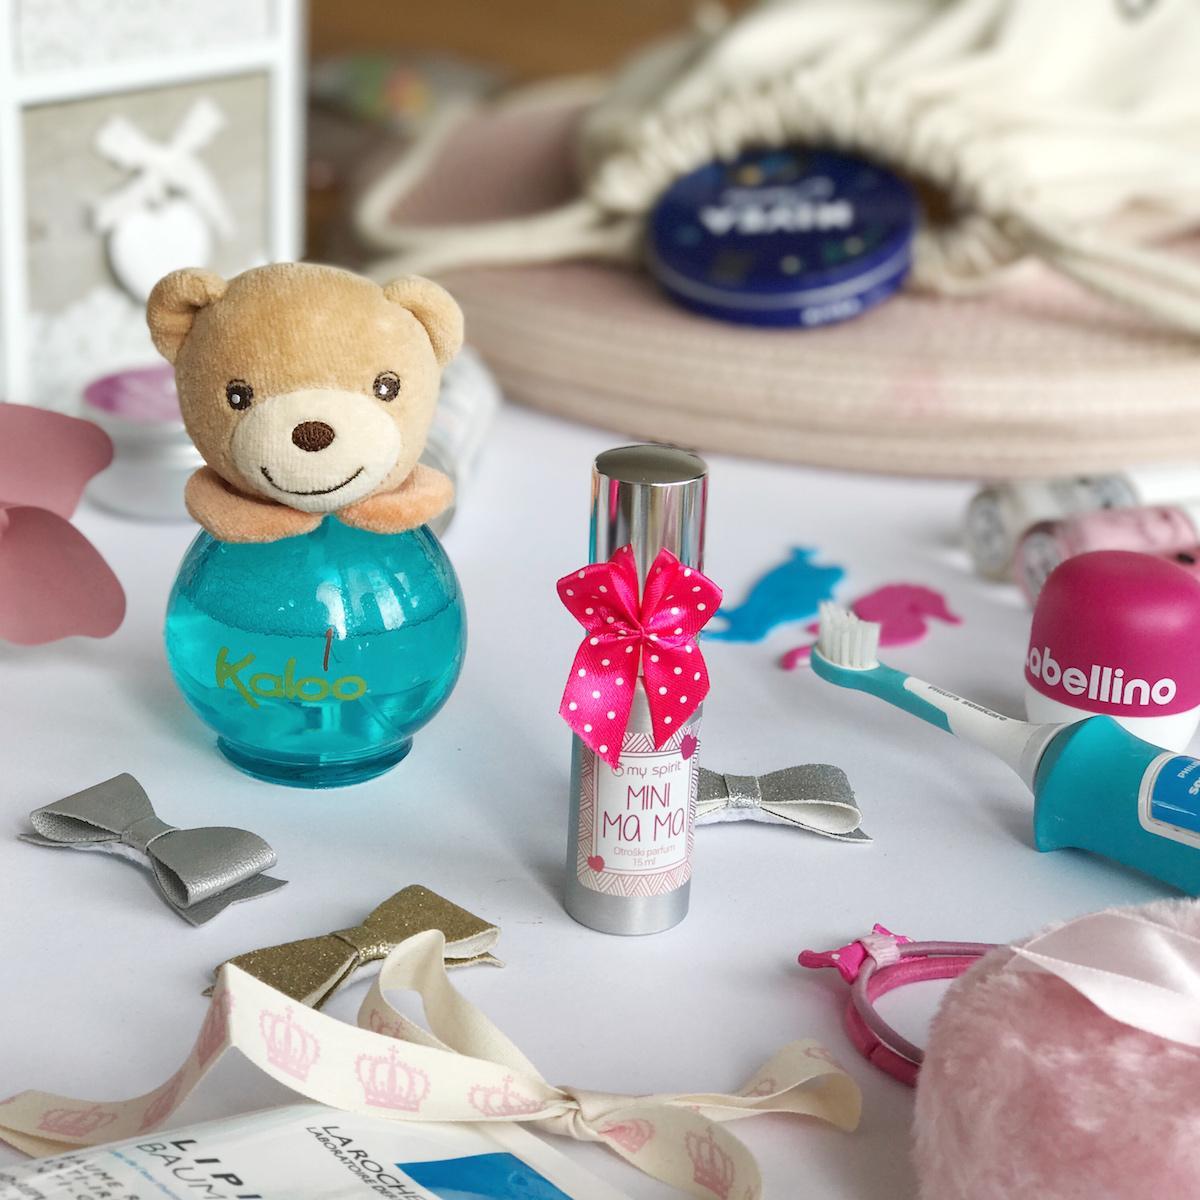 kozmetika kreme otroci najstniki beautyfullblog nega mini mama my spirit rebeka